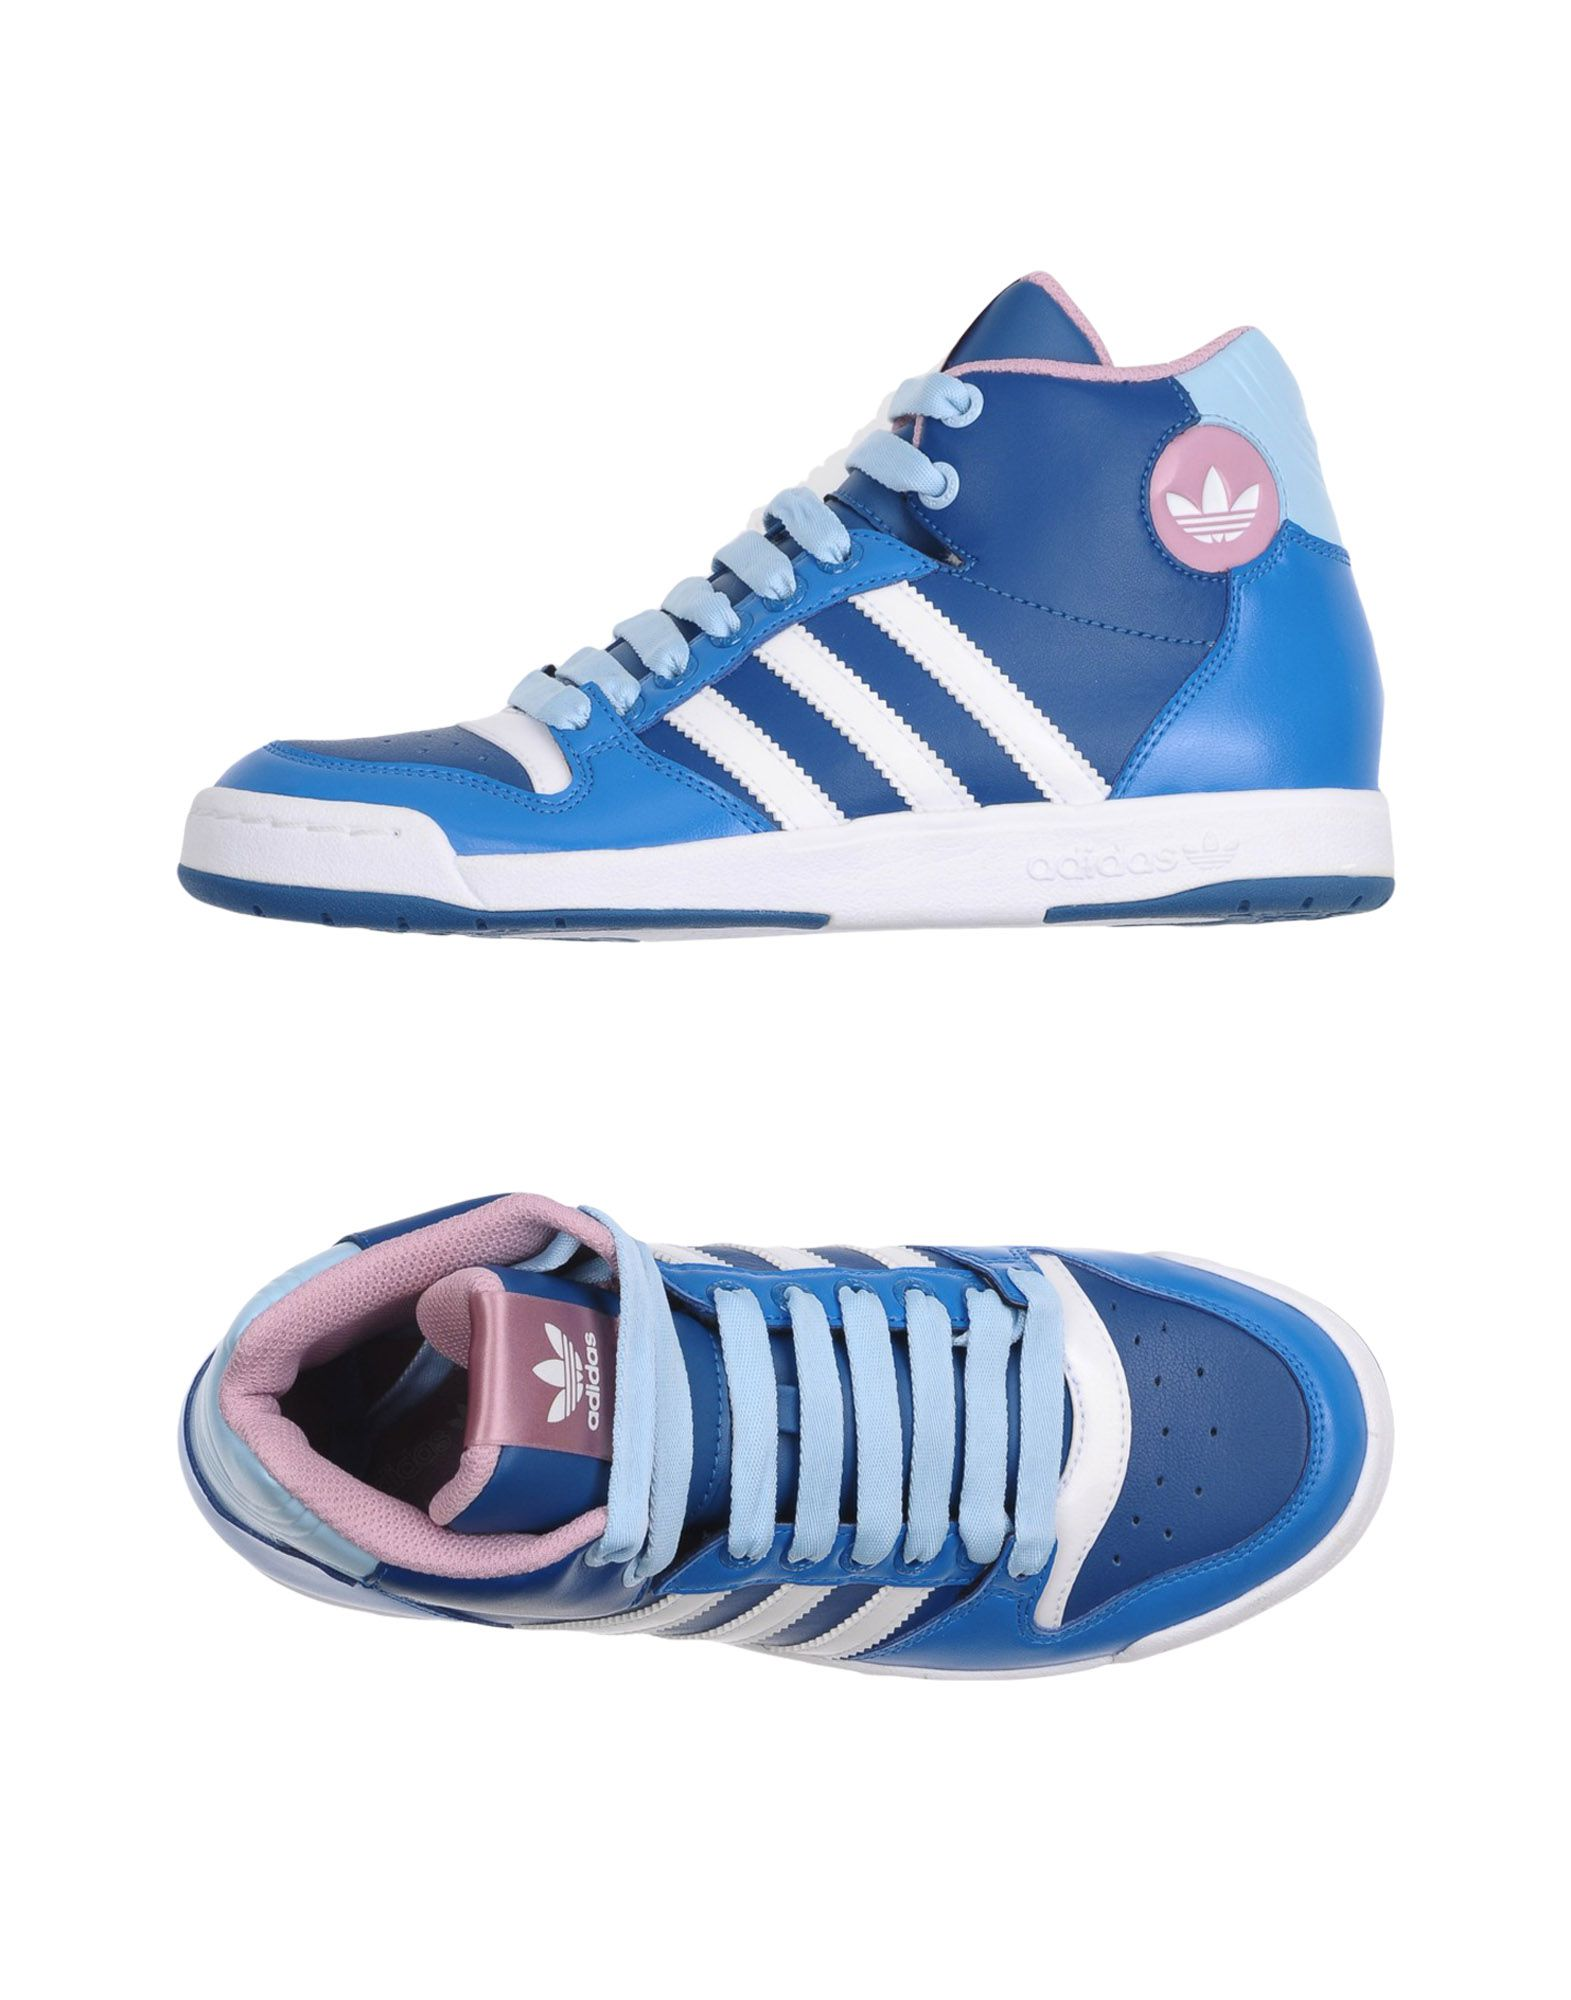 Adidas Originals Originals Adidas Sneakers Damen  11242503VW Gute Qualität beliebte Schuhe b2ce91